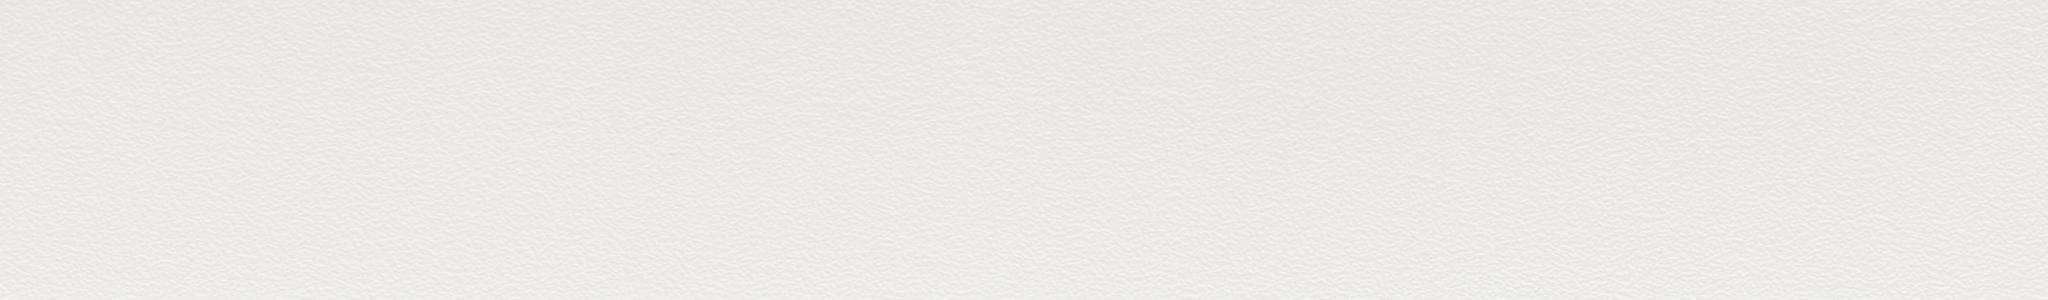 HU 172543 кромка ABS серая агат жемчуг XG